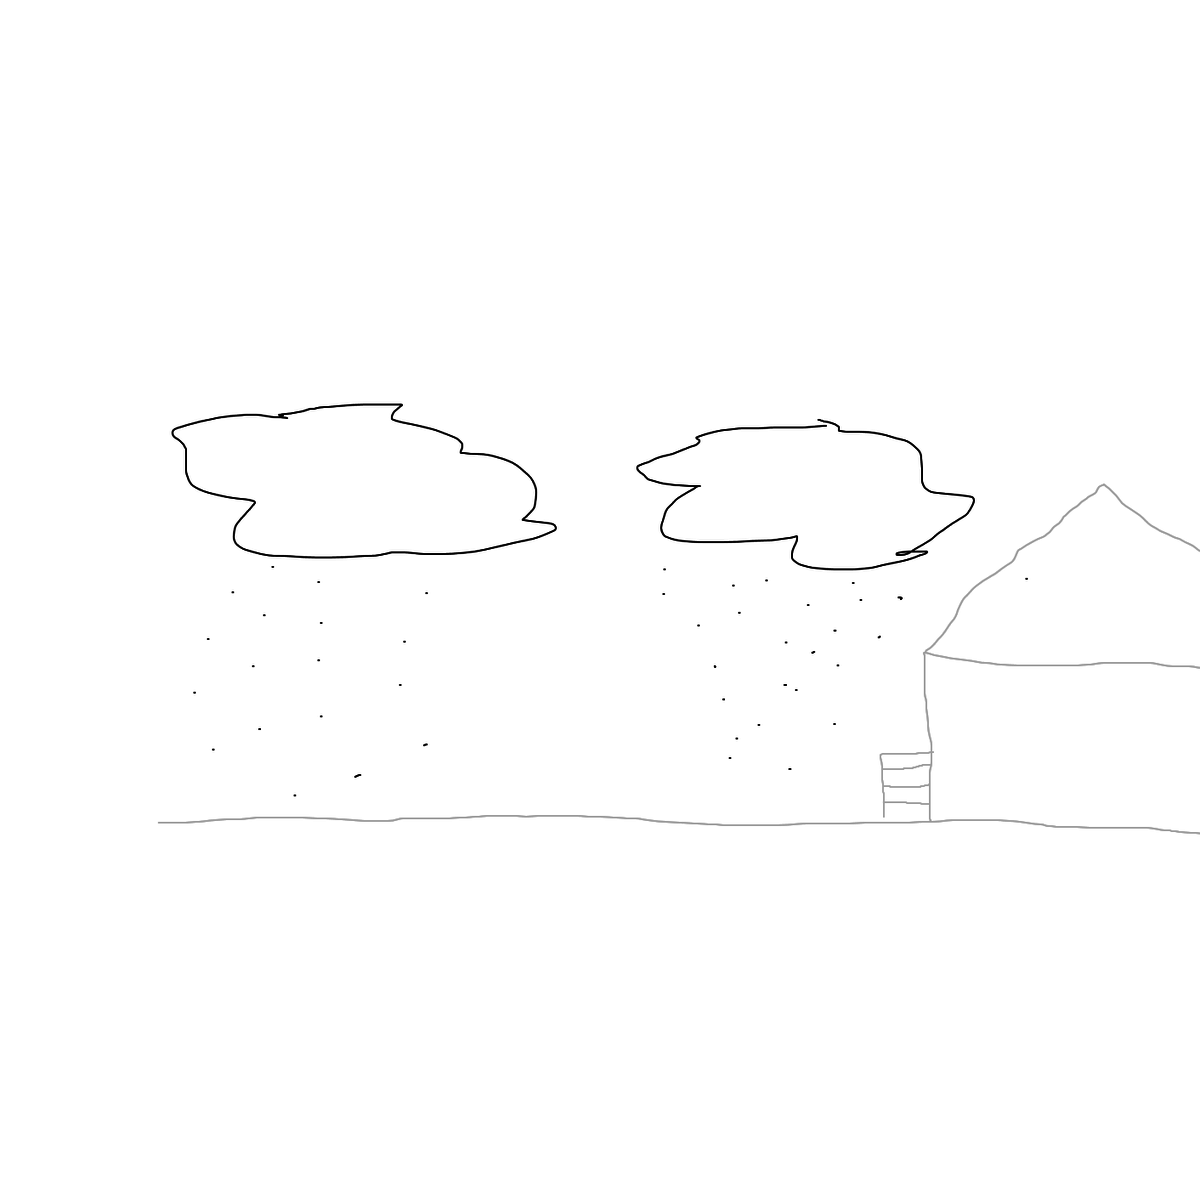 BAAAM drawing#1749 lat:46.3245429992675800lng: -79.4821472167968800